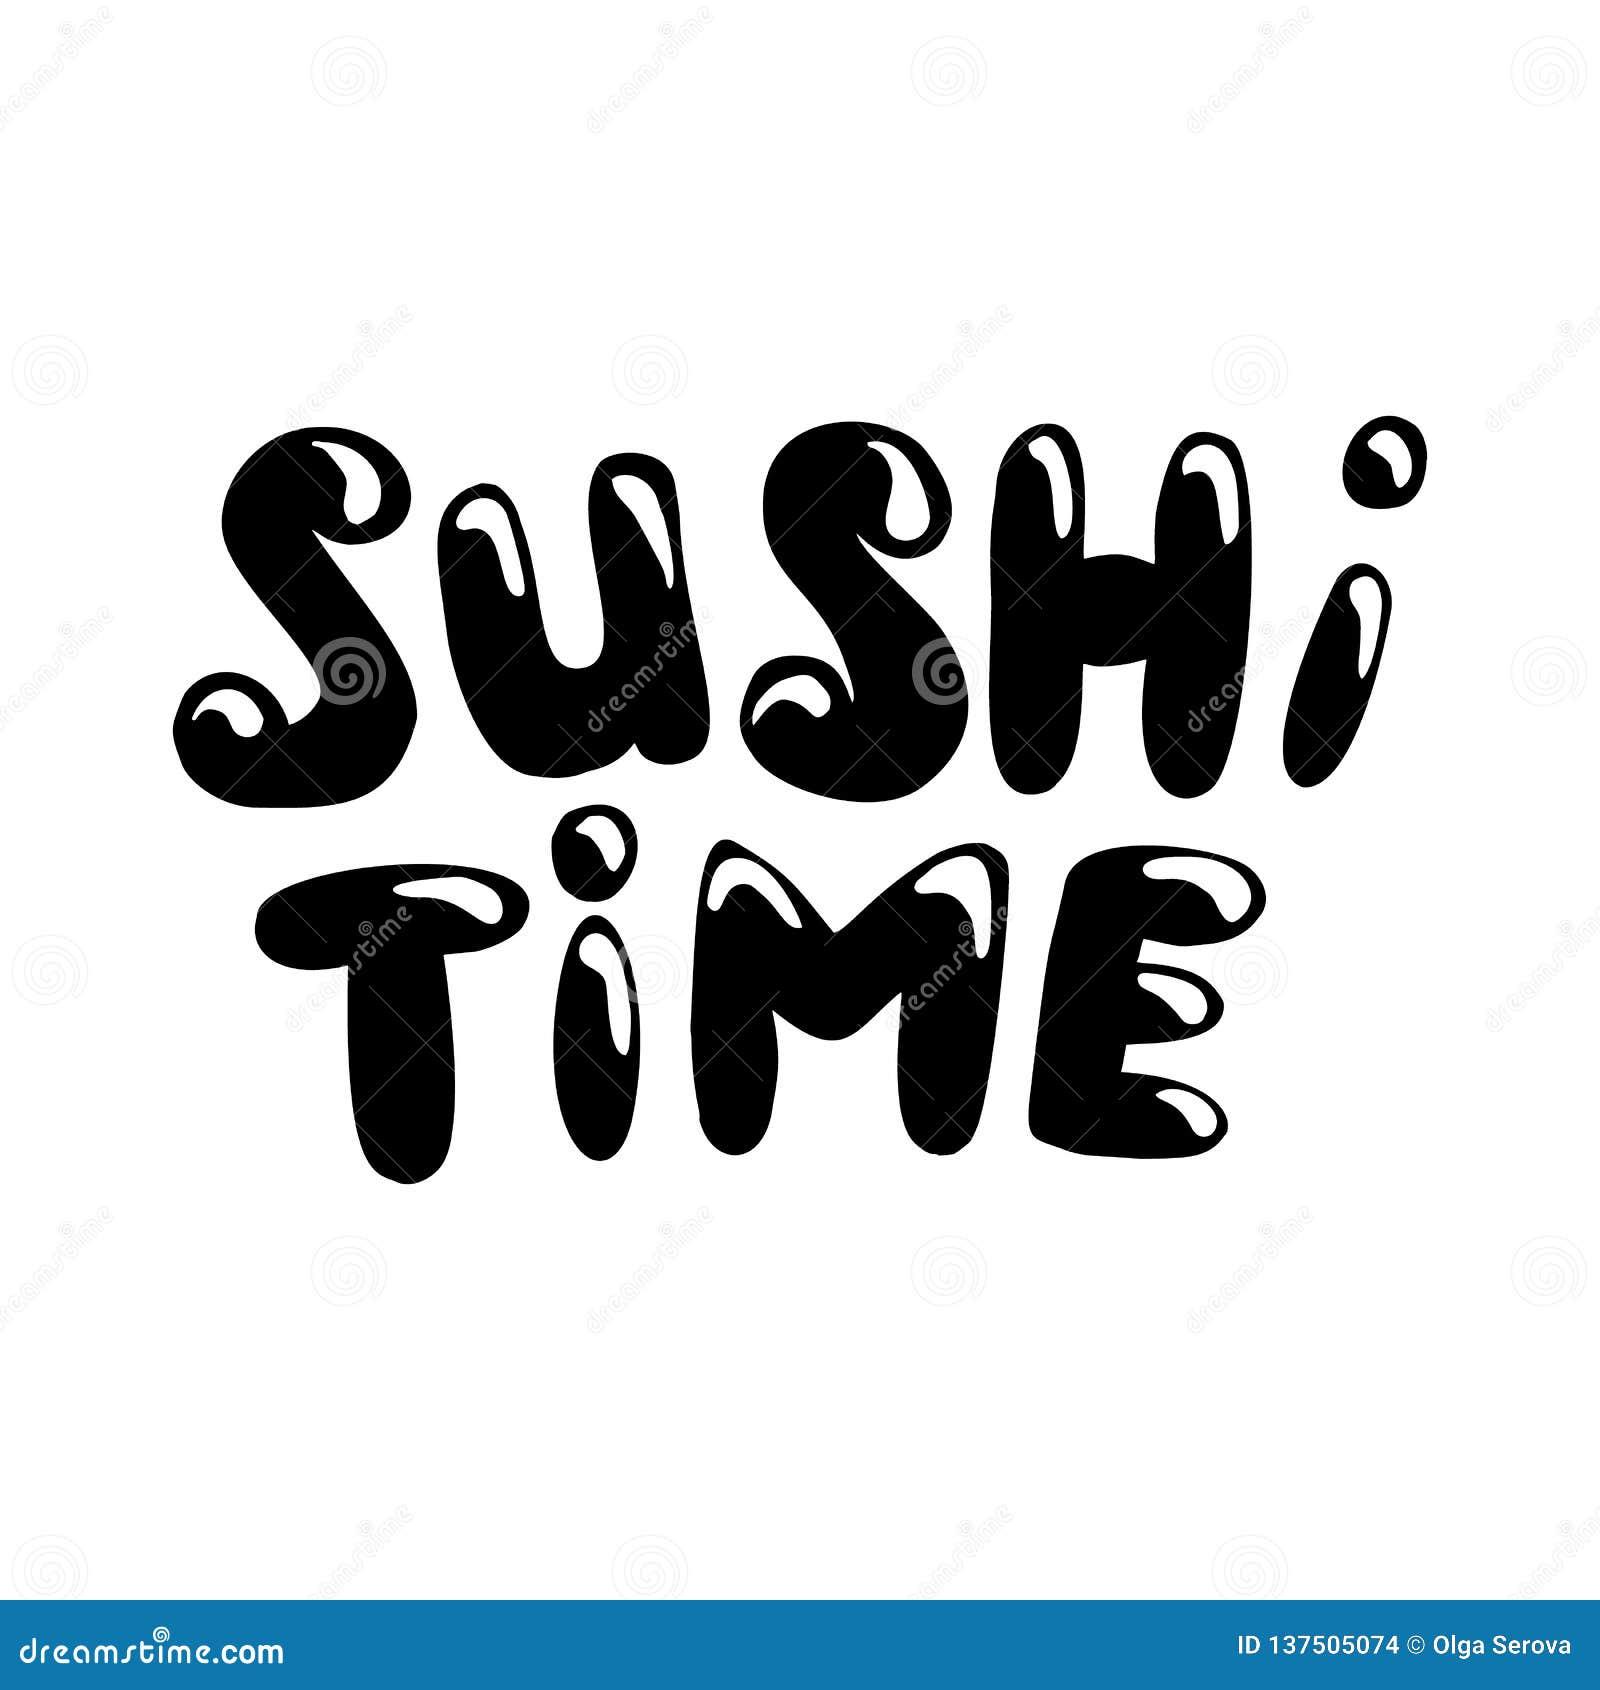 Sushi time lettering